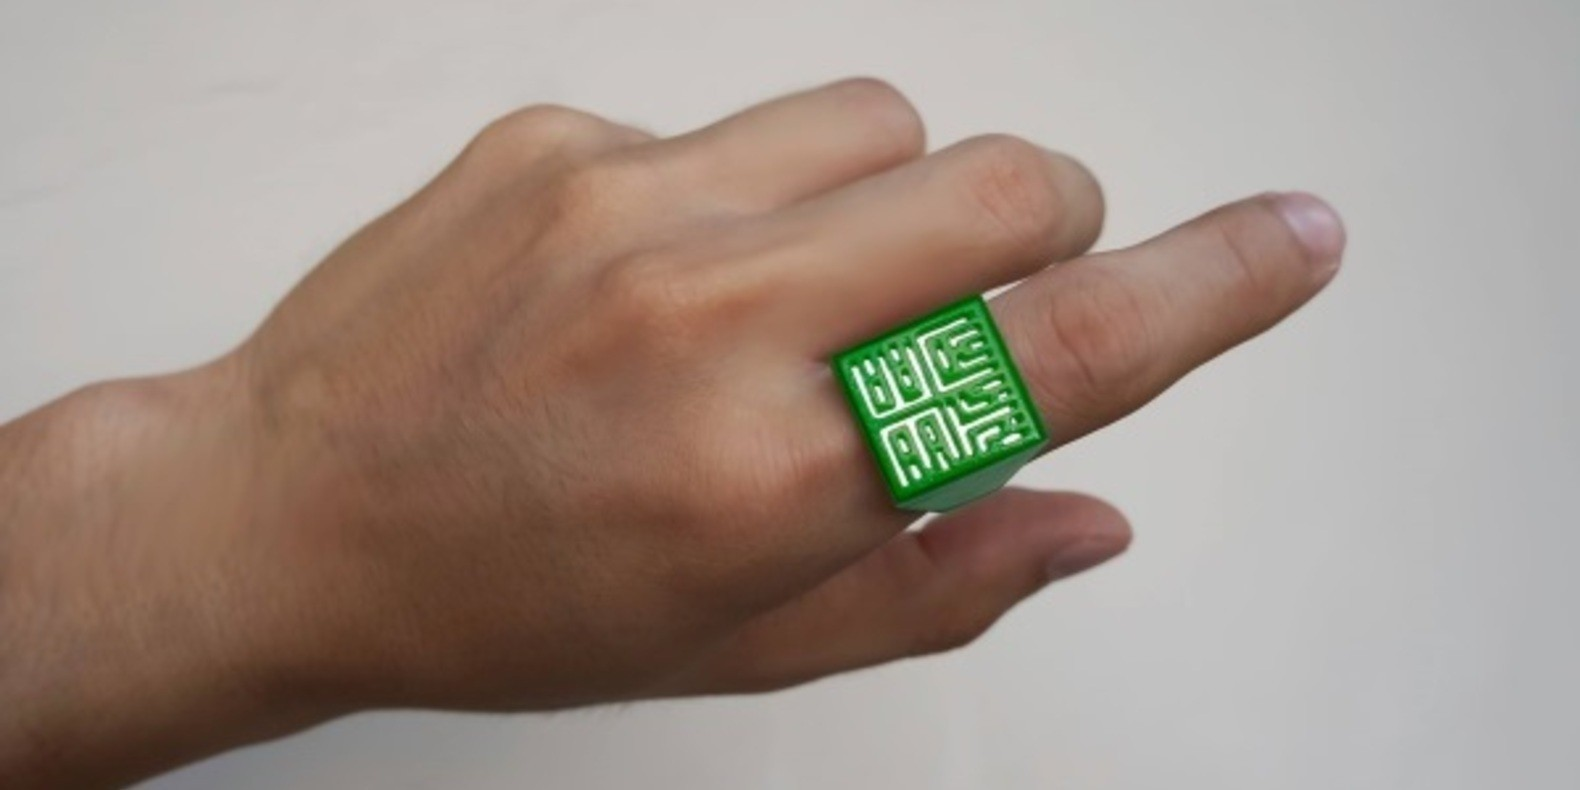 sesame ring theory 3D printed bague imprimée en 3D cults3D fichier 3D kickstarter boston MIT 2